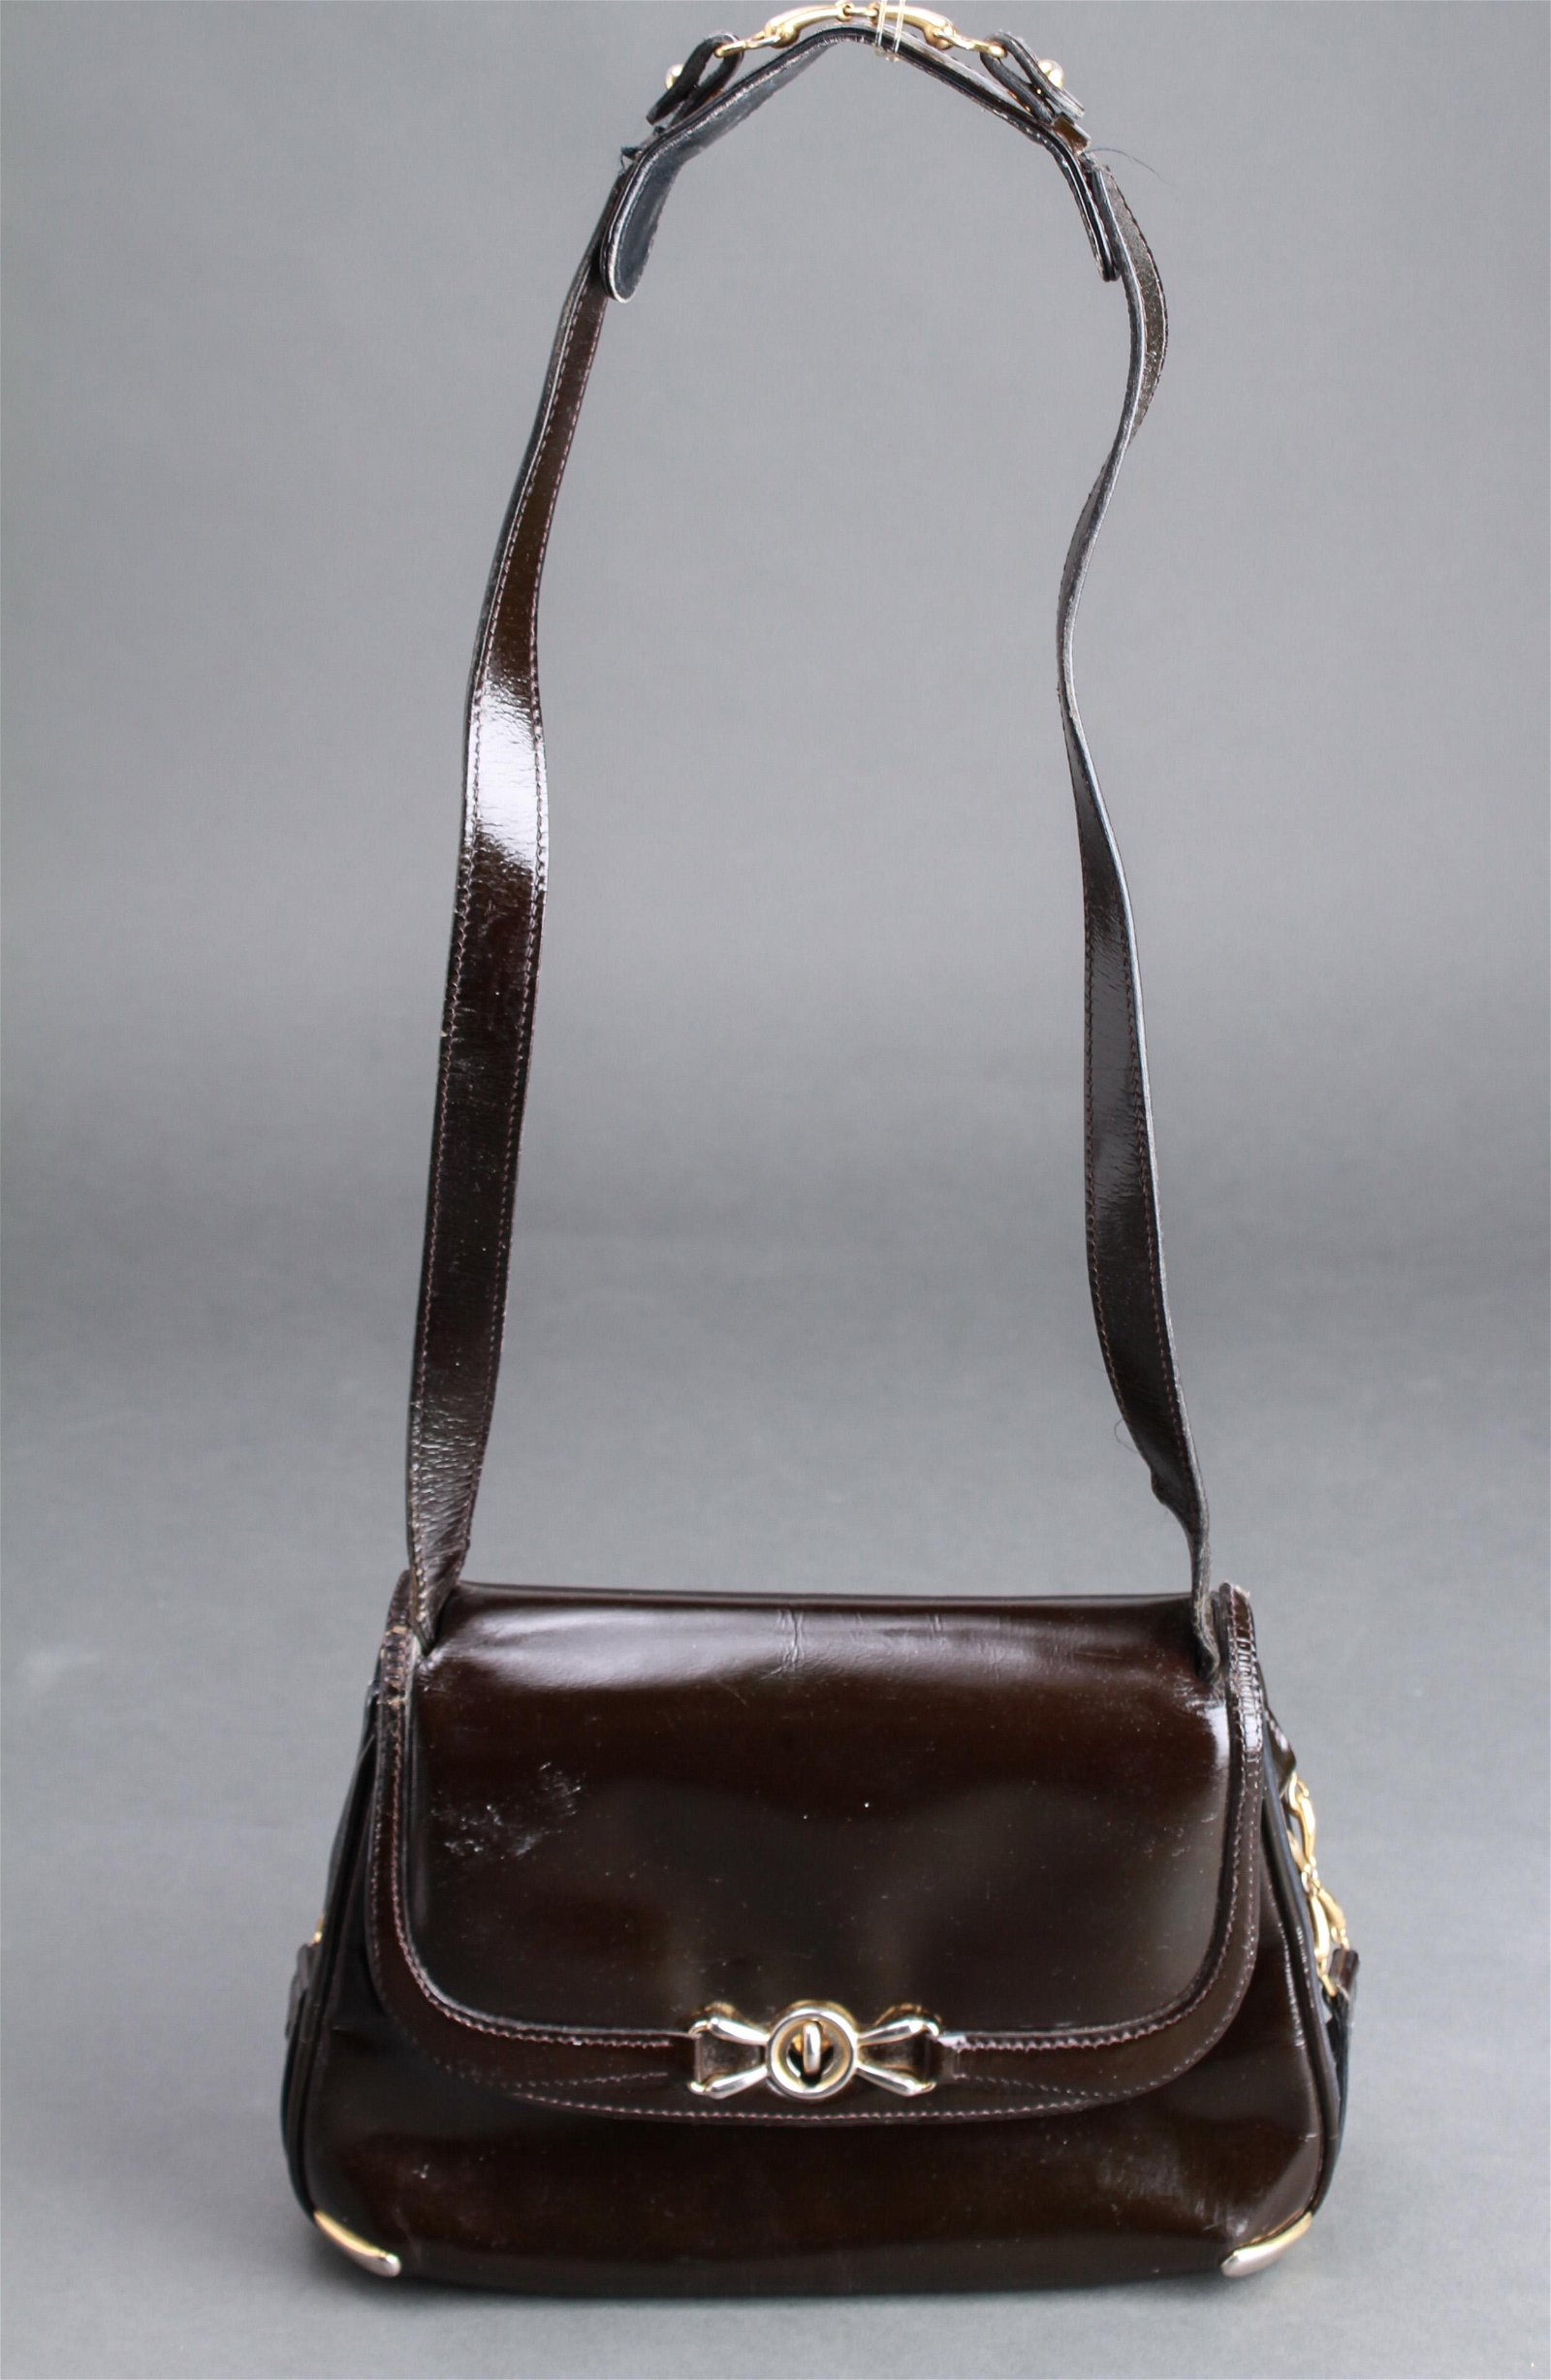 Gucci Vintage Black Leather Purse